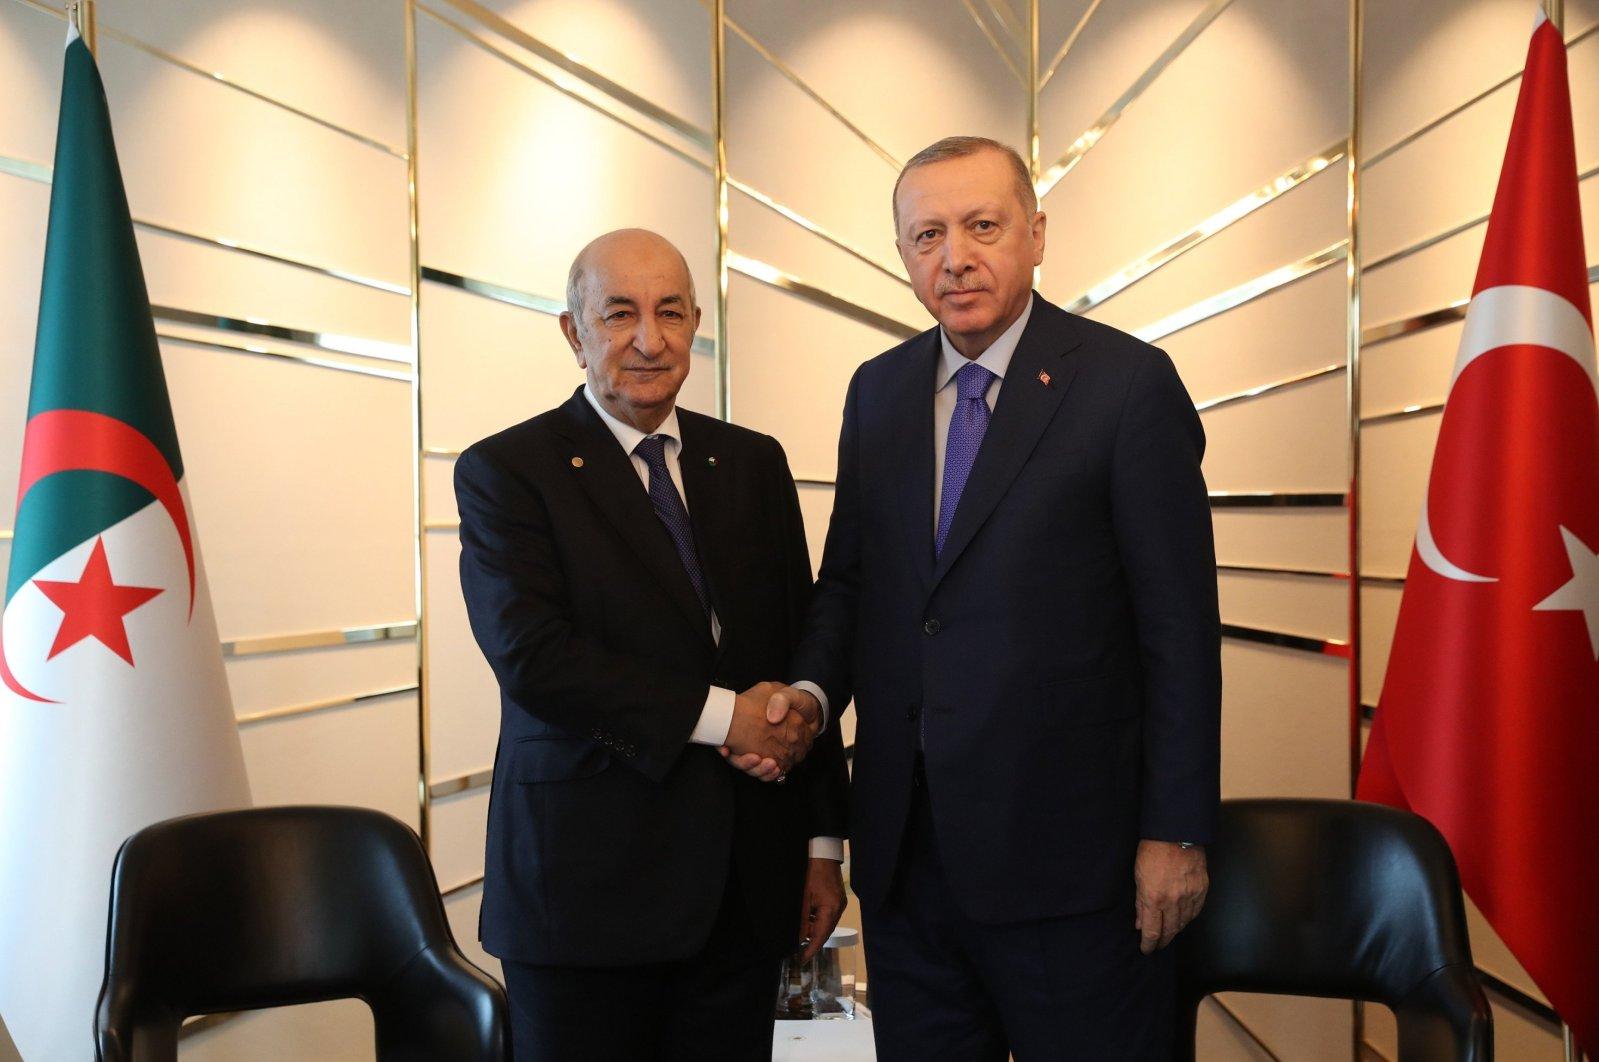 Turkish President Recep Tayyip Erdoğan (R) shakes hands with Algerian President Abdelmadjid Tebboune ahead of a conference on Libya in Berlin, Germany, Jan. 21, 2020. (IHA)